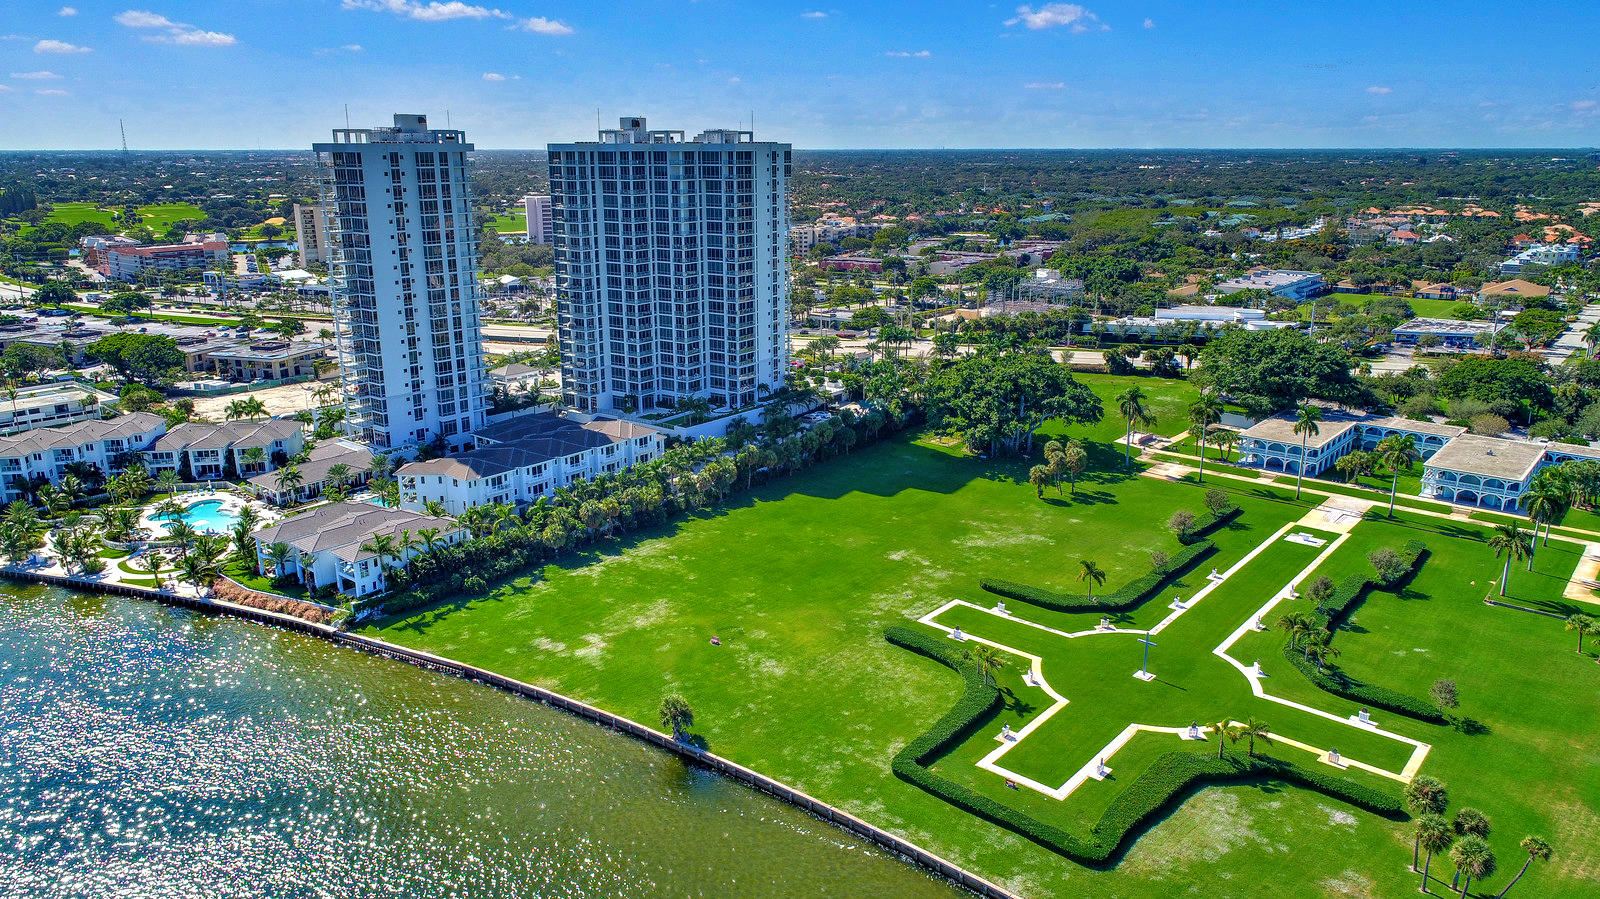 118 Water Club Court, North Palm Beach, Florida 33408, 3 Bedrooms Bedrooms, ,3.1 BathroomsBathrooms,A,Villa,Water Club,RX-10484893